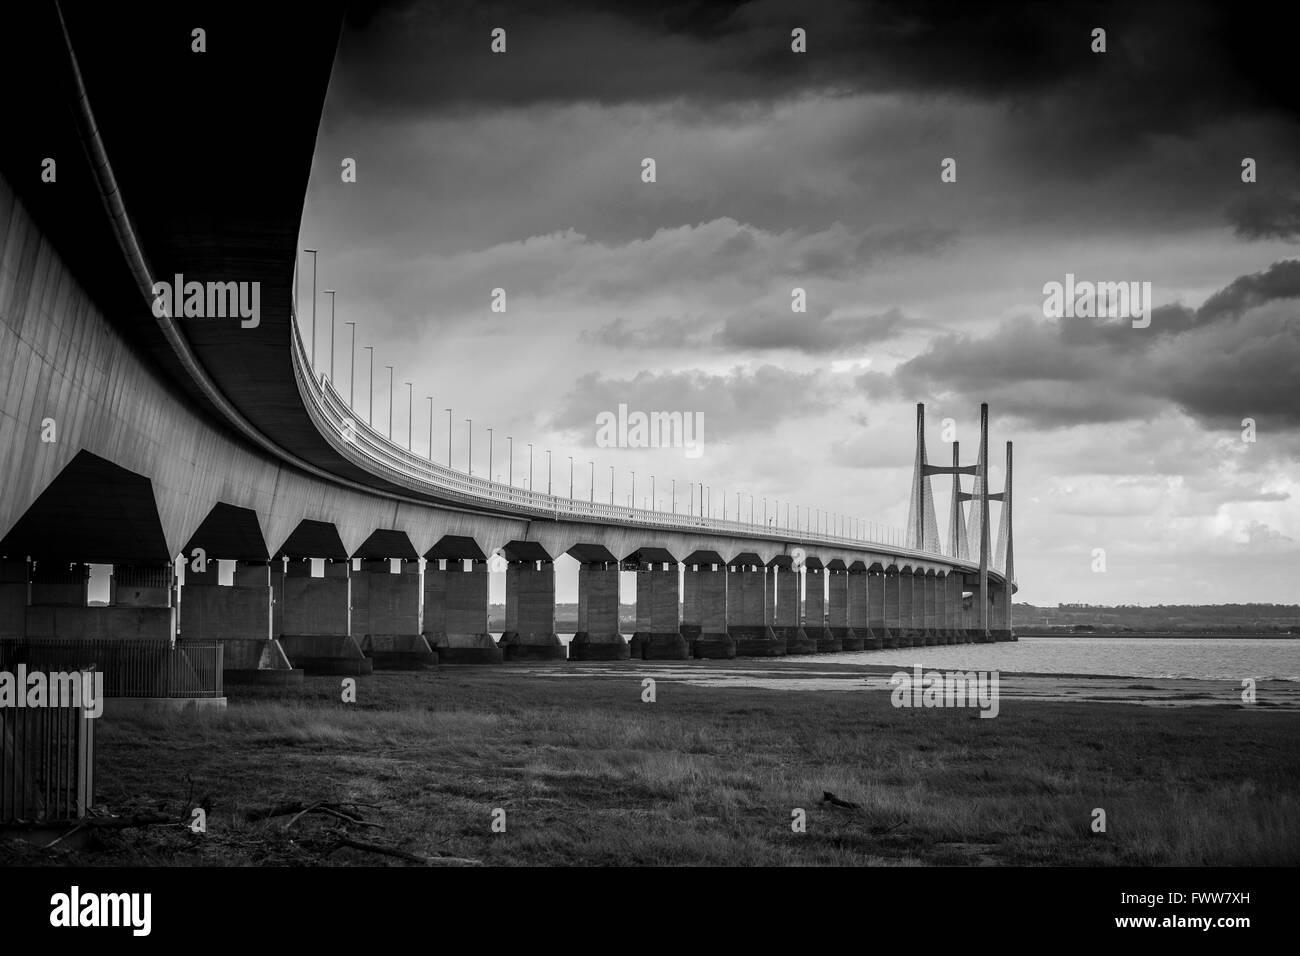 Severn Bridge crossing - Stock Image